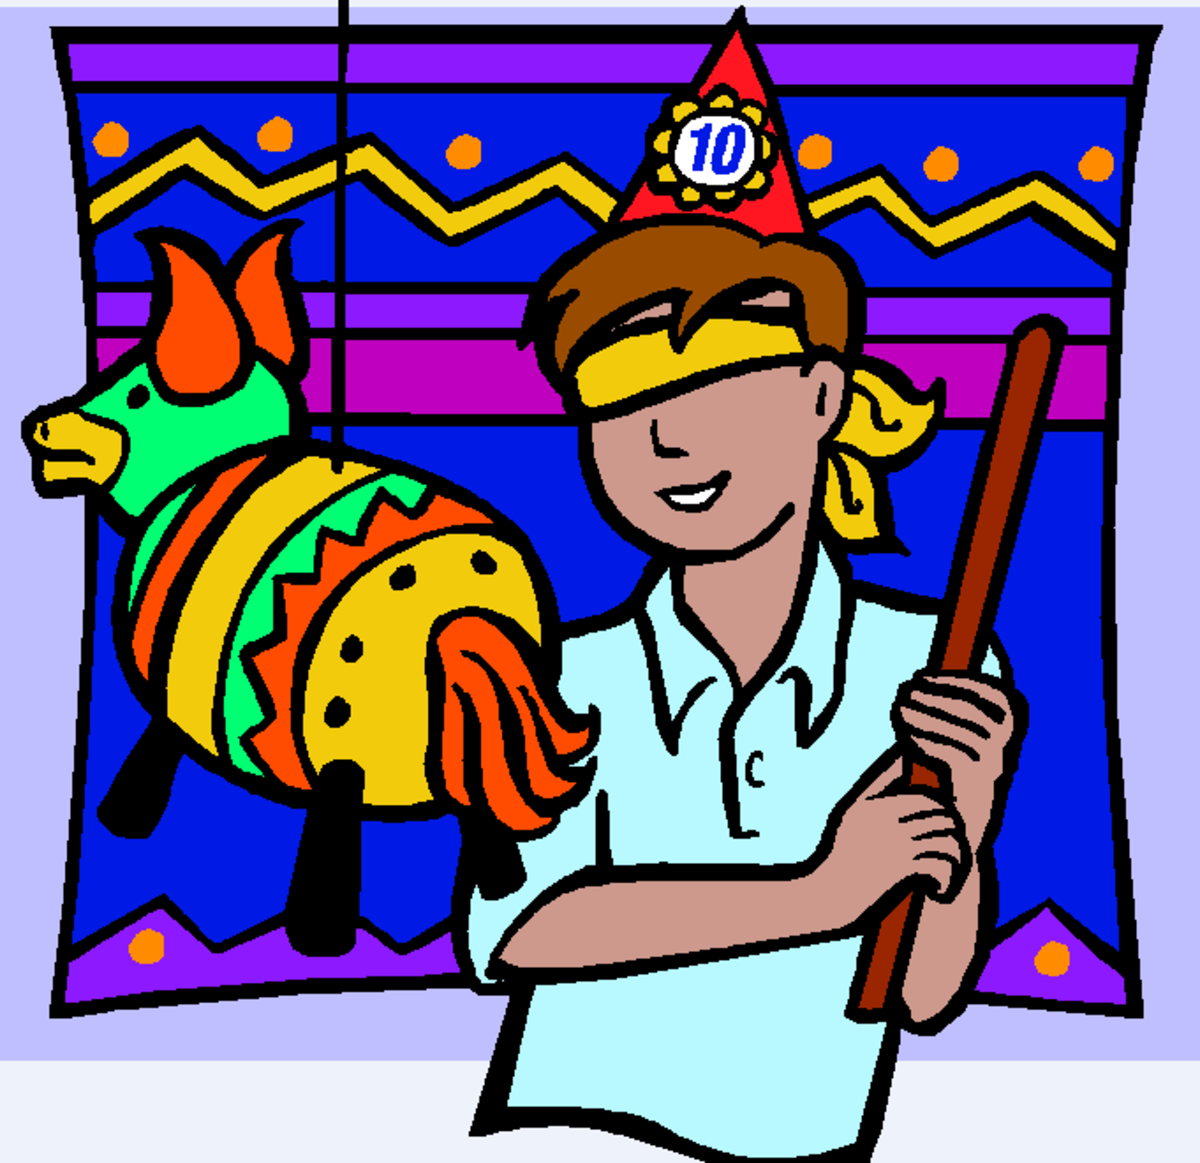 Boy Hitting Piñata at Birthday Party